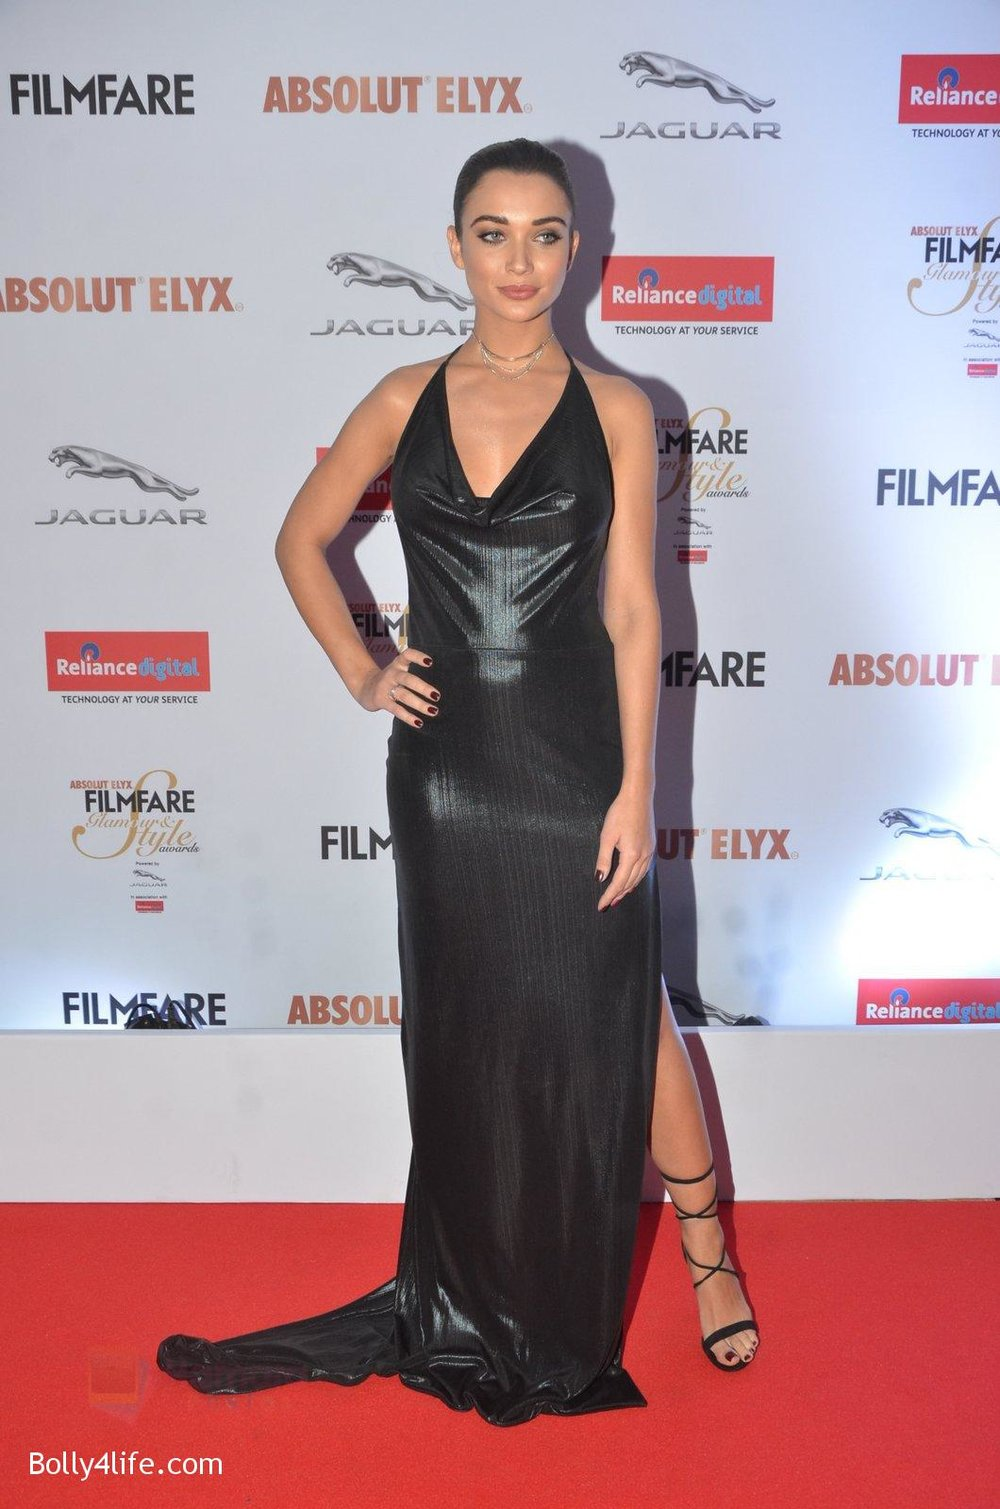 Amy-Jackson-at-Filmfare-Glamour-Style-Awards-2016-in-Mumbai-on-15th-Oct-2016-1427.jpg